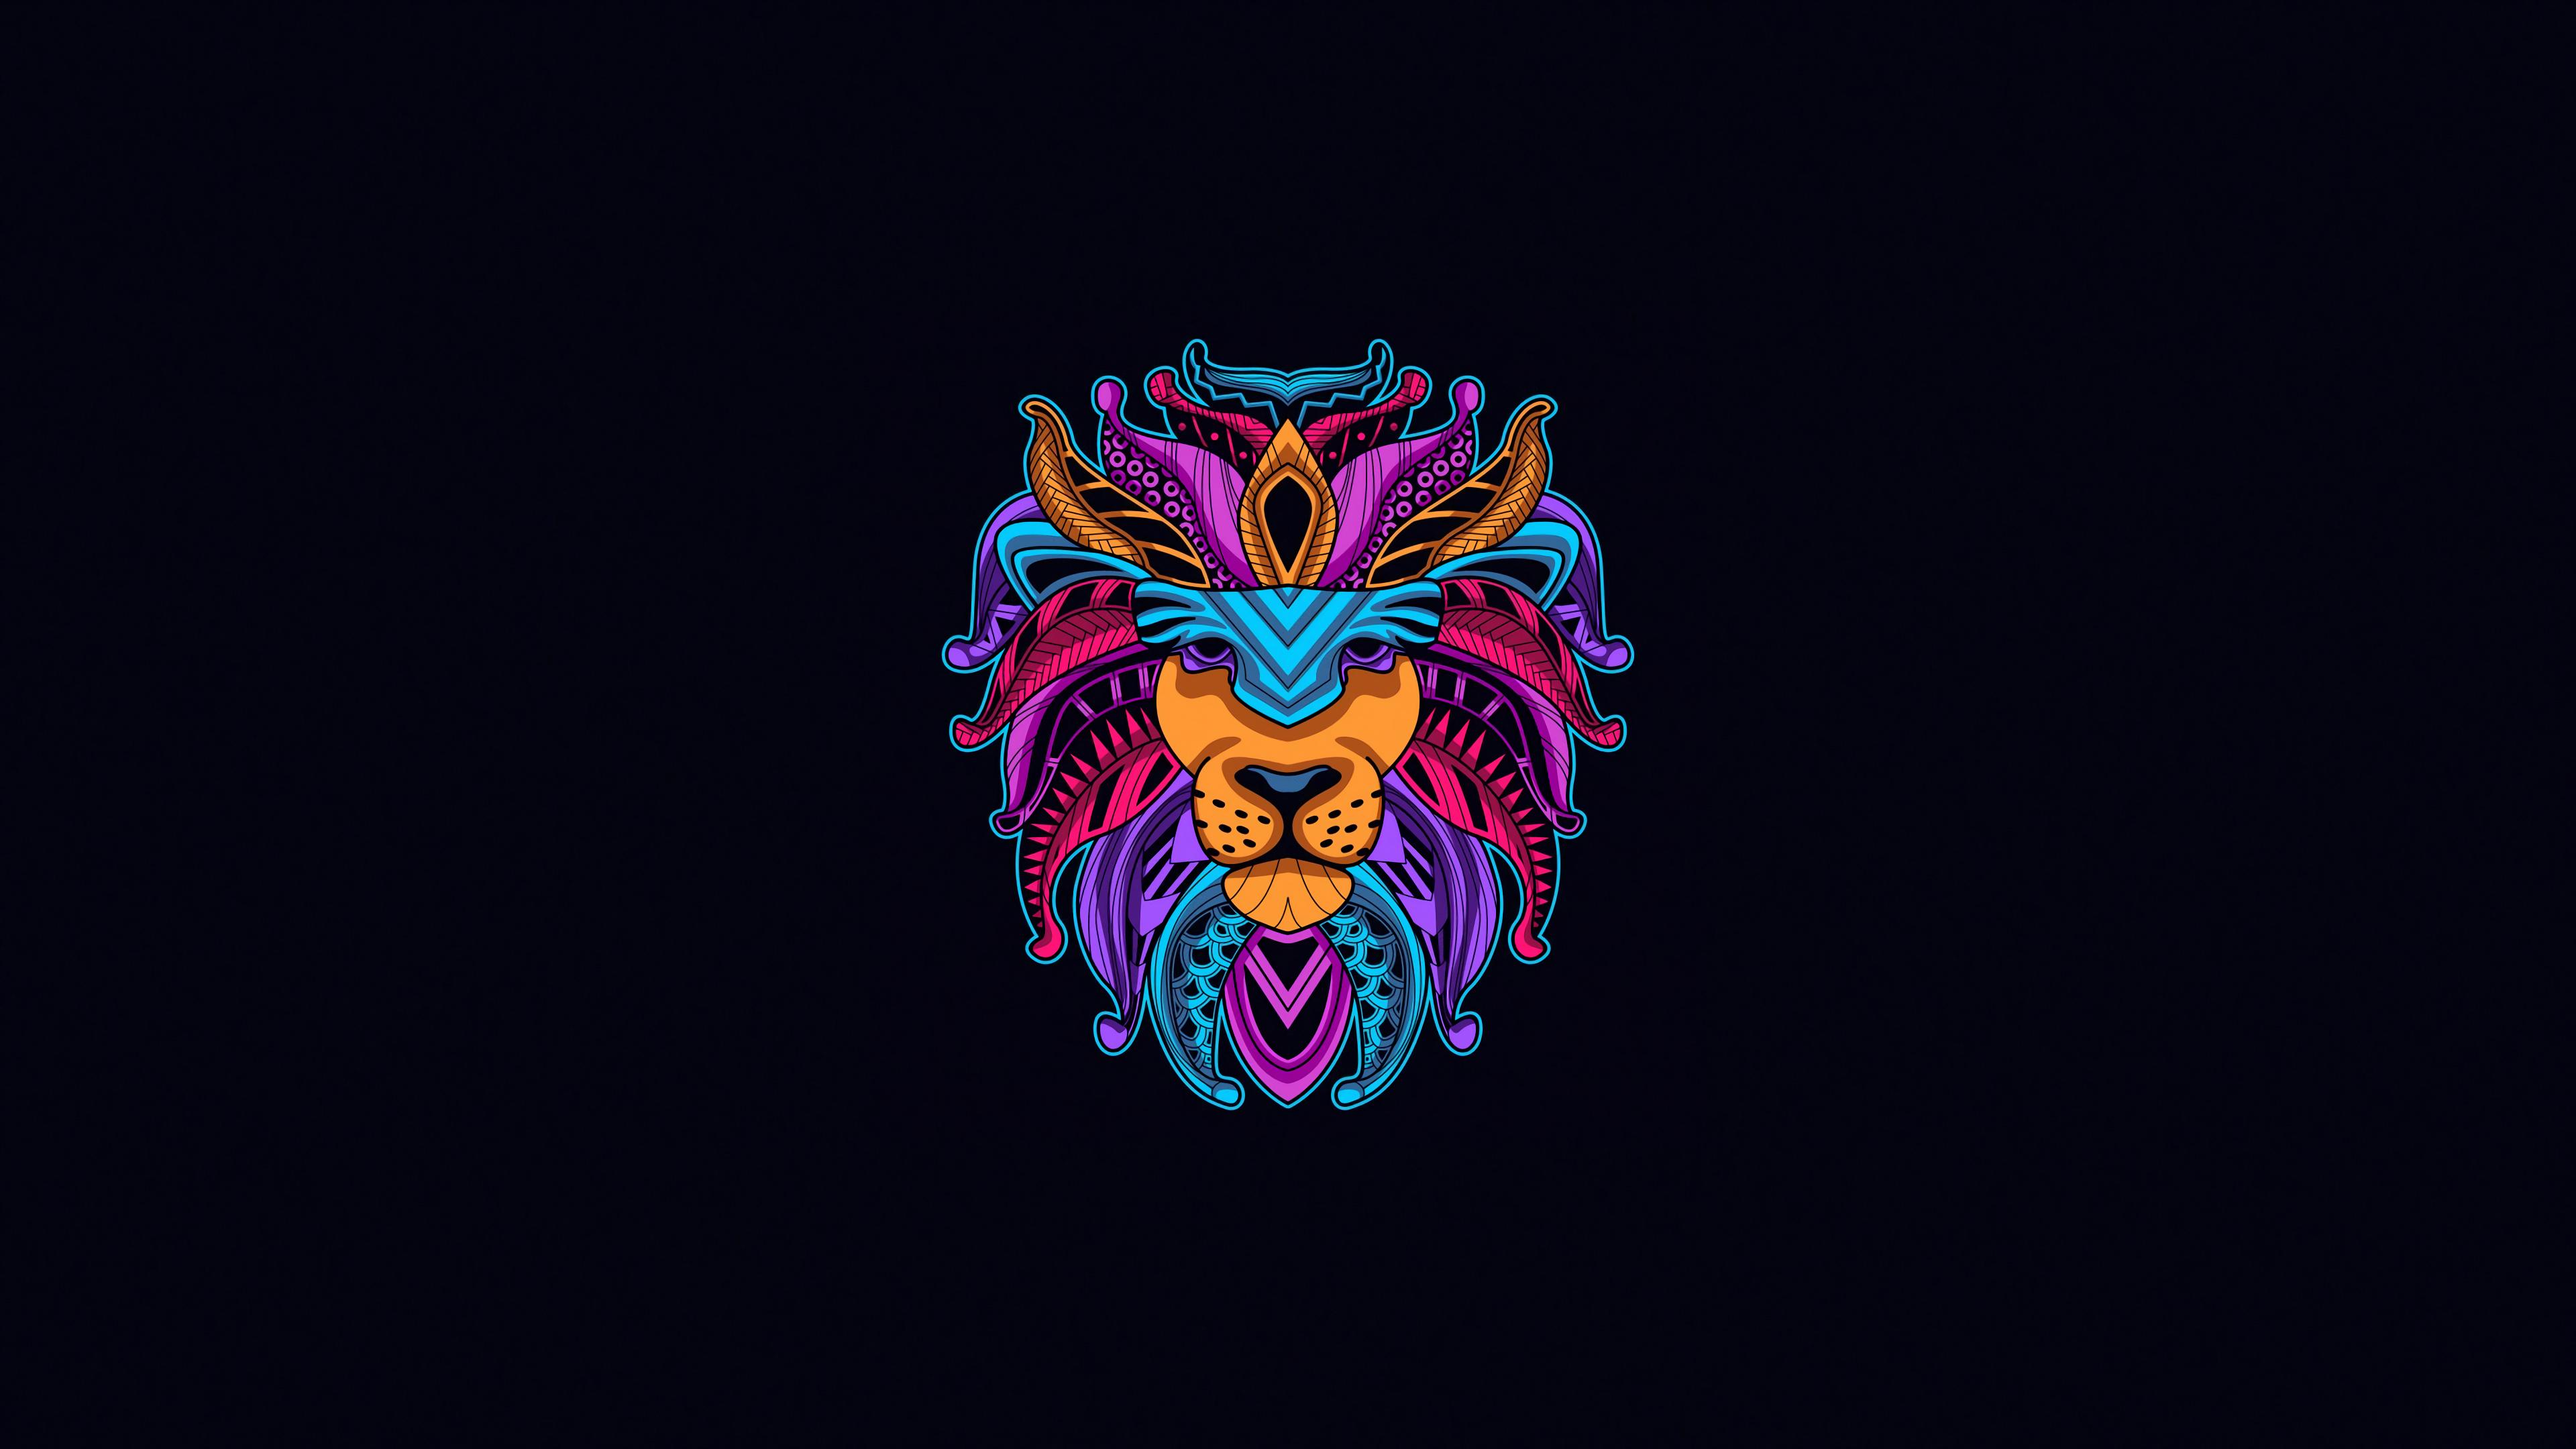 Lion Minimal 4k Hd Artist 4k Wallpapers Images